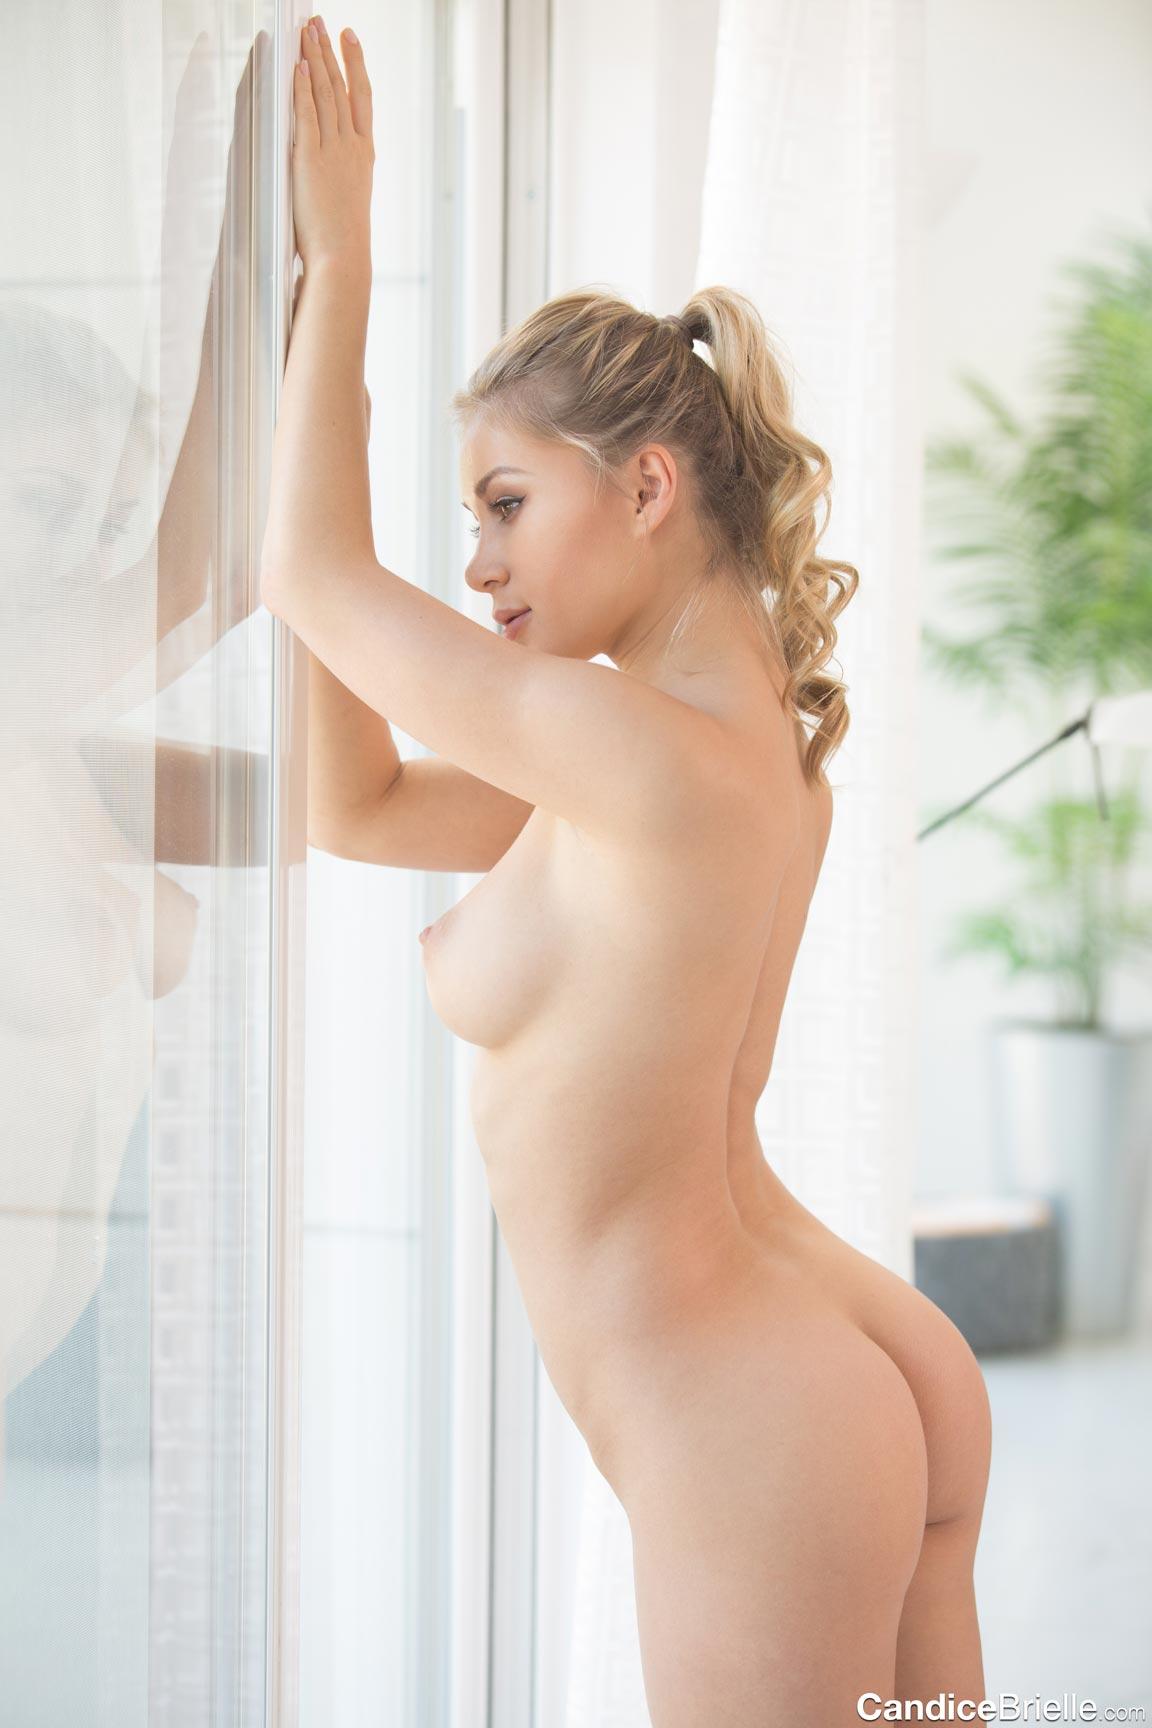 European bikini contests